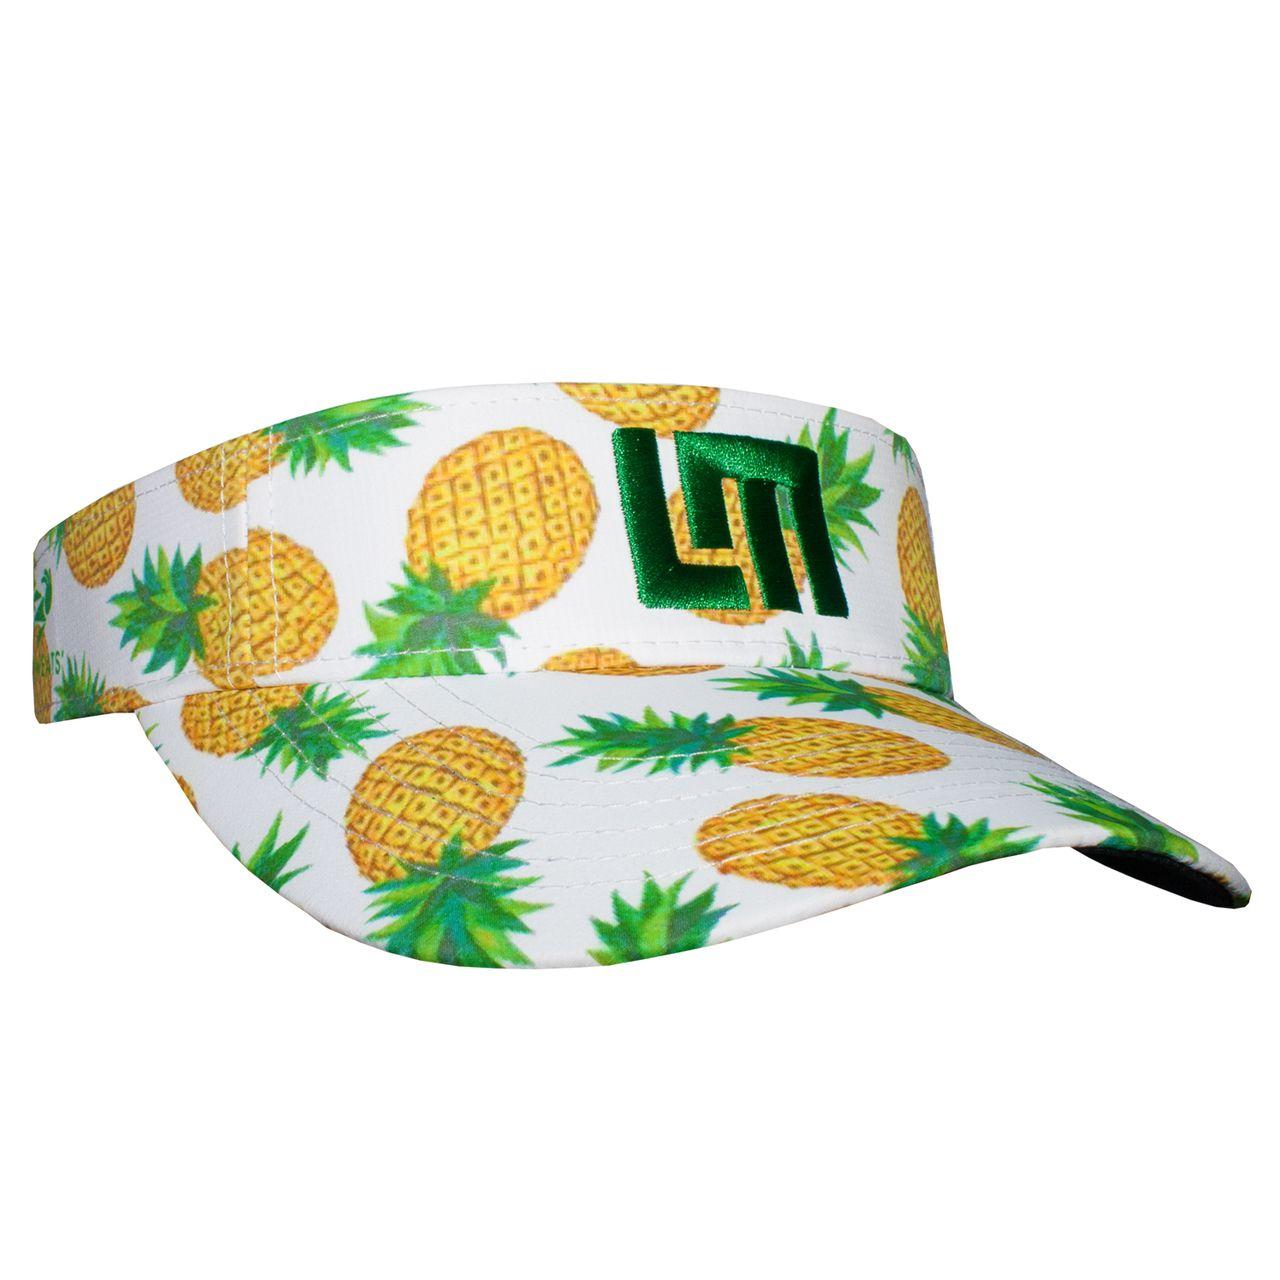 LOUDMOUTH 英國高爾夫服飾品牌-白底鳳梨中空帽